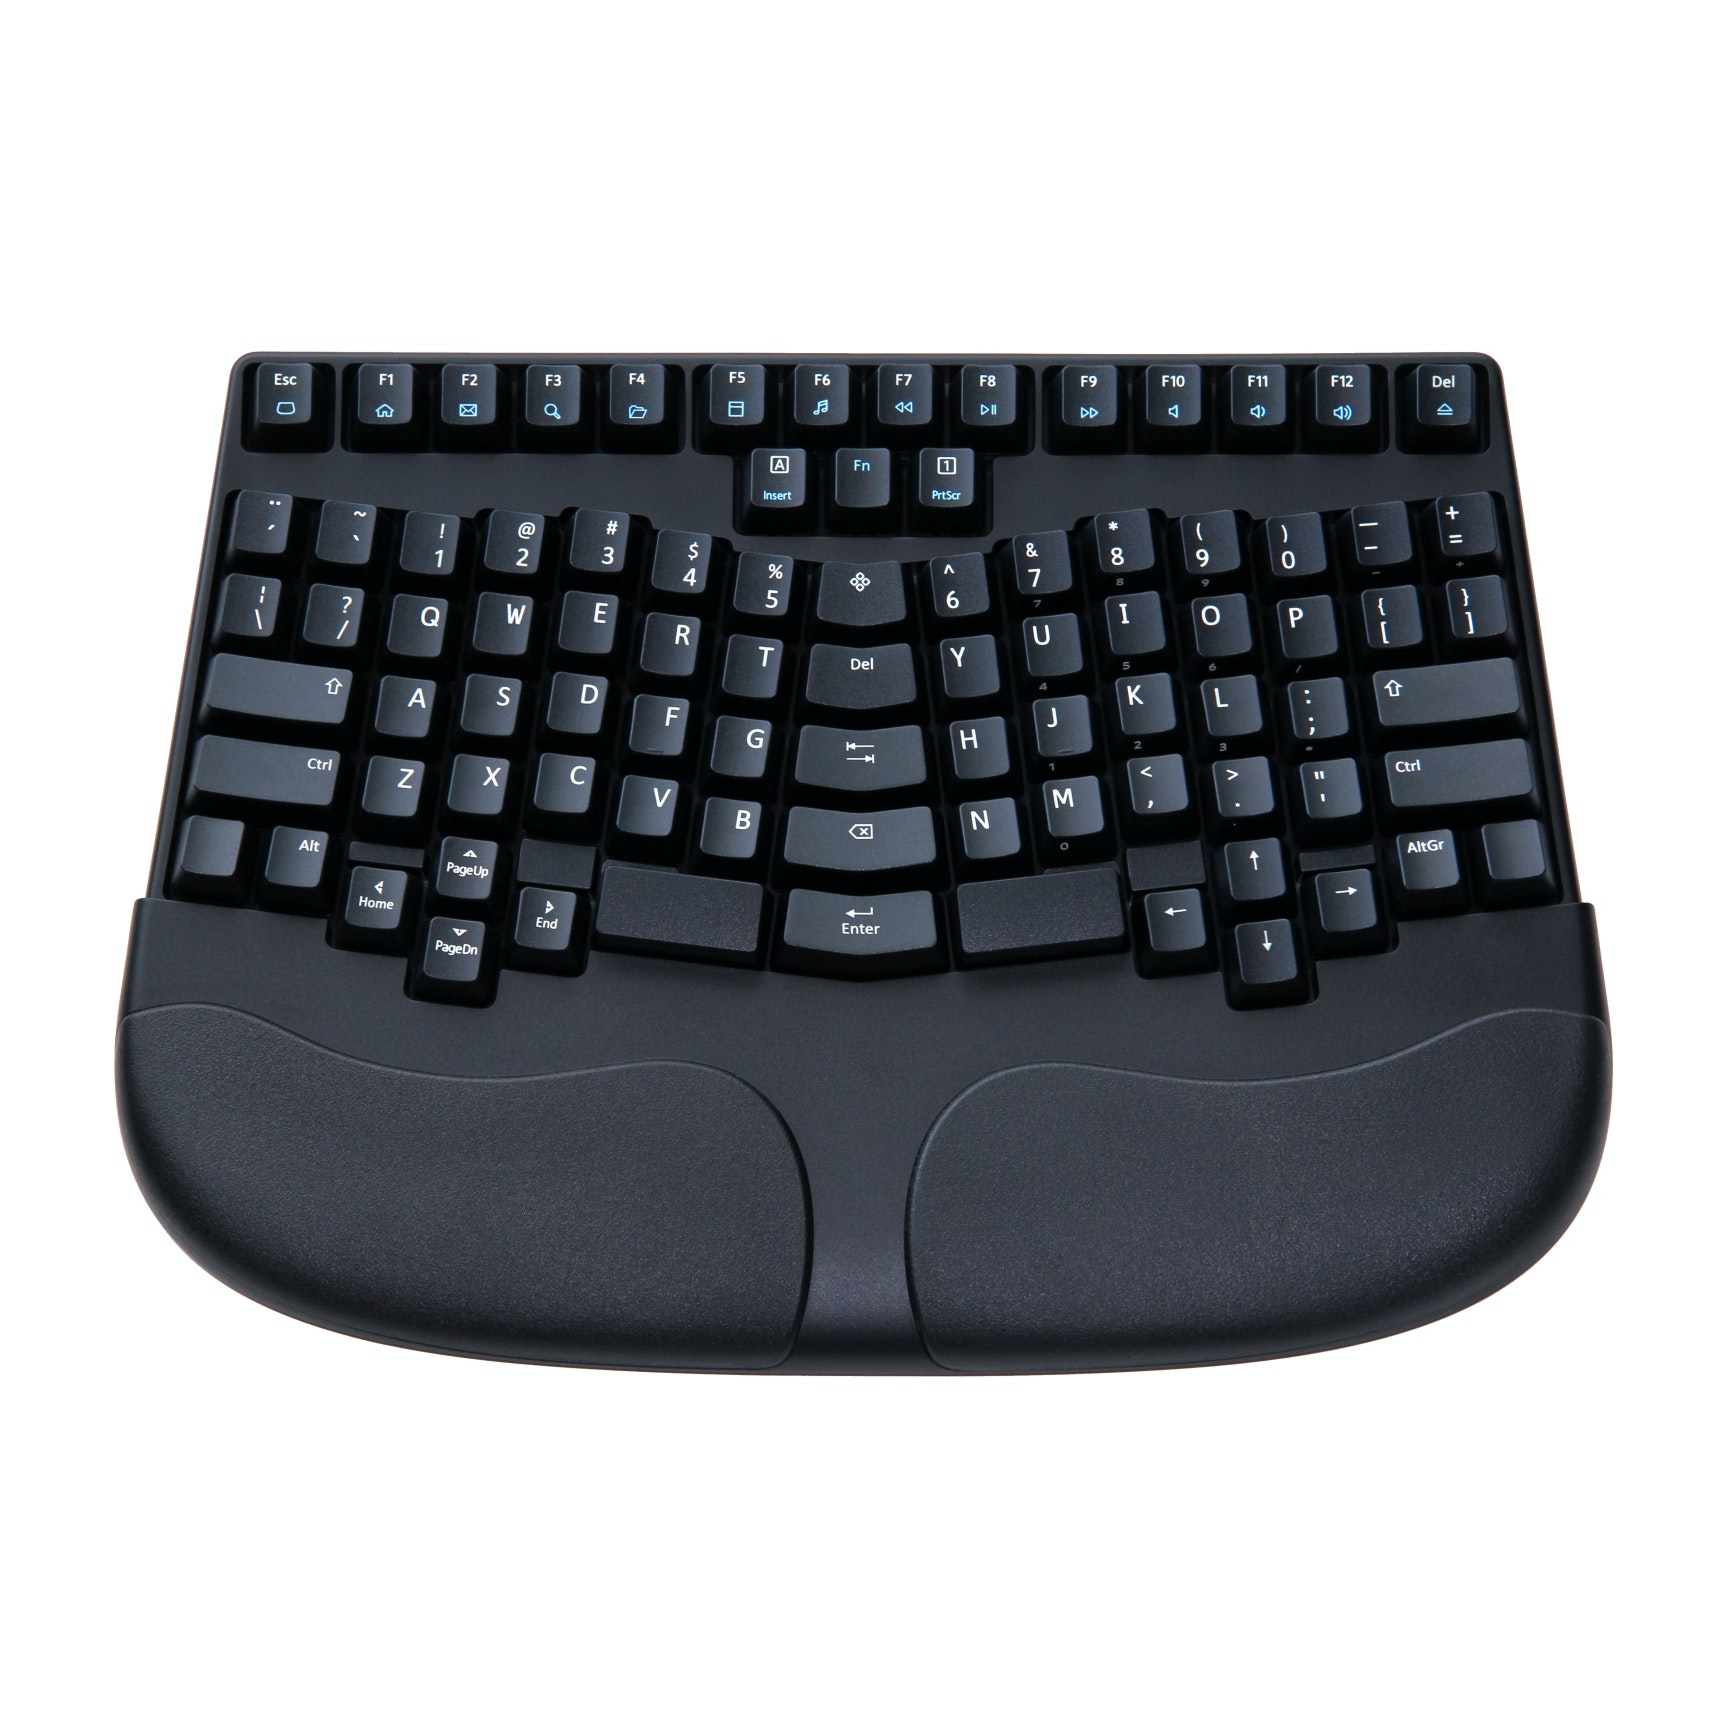 Truly Ergonomic Mechanical Keyboard Model 209